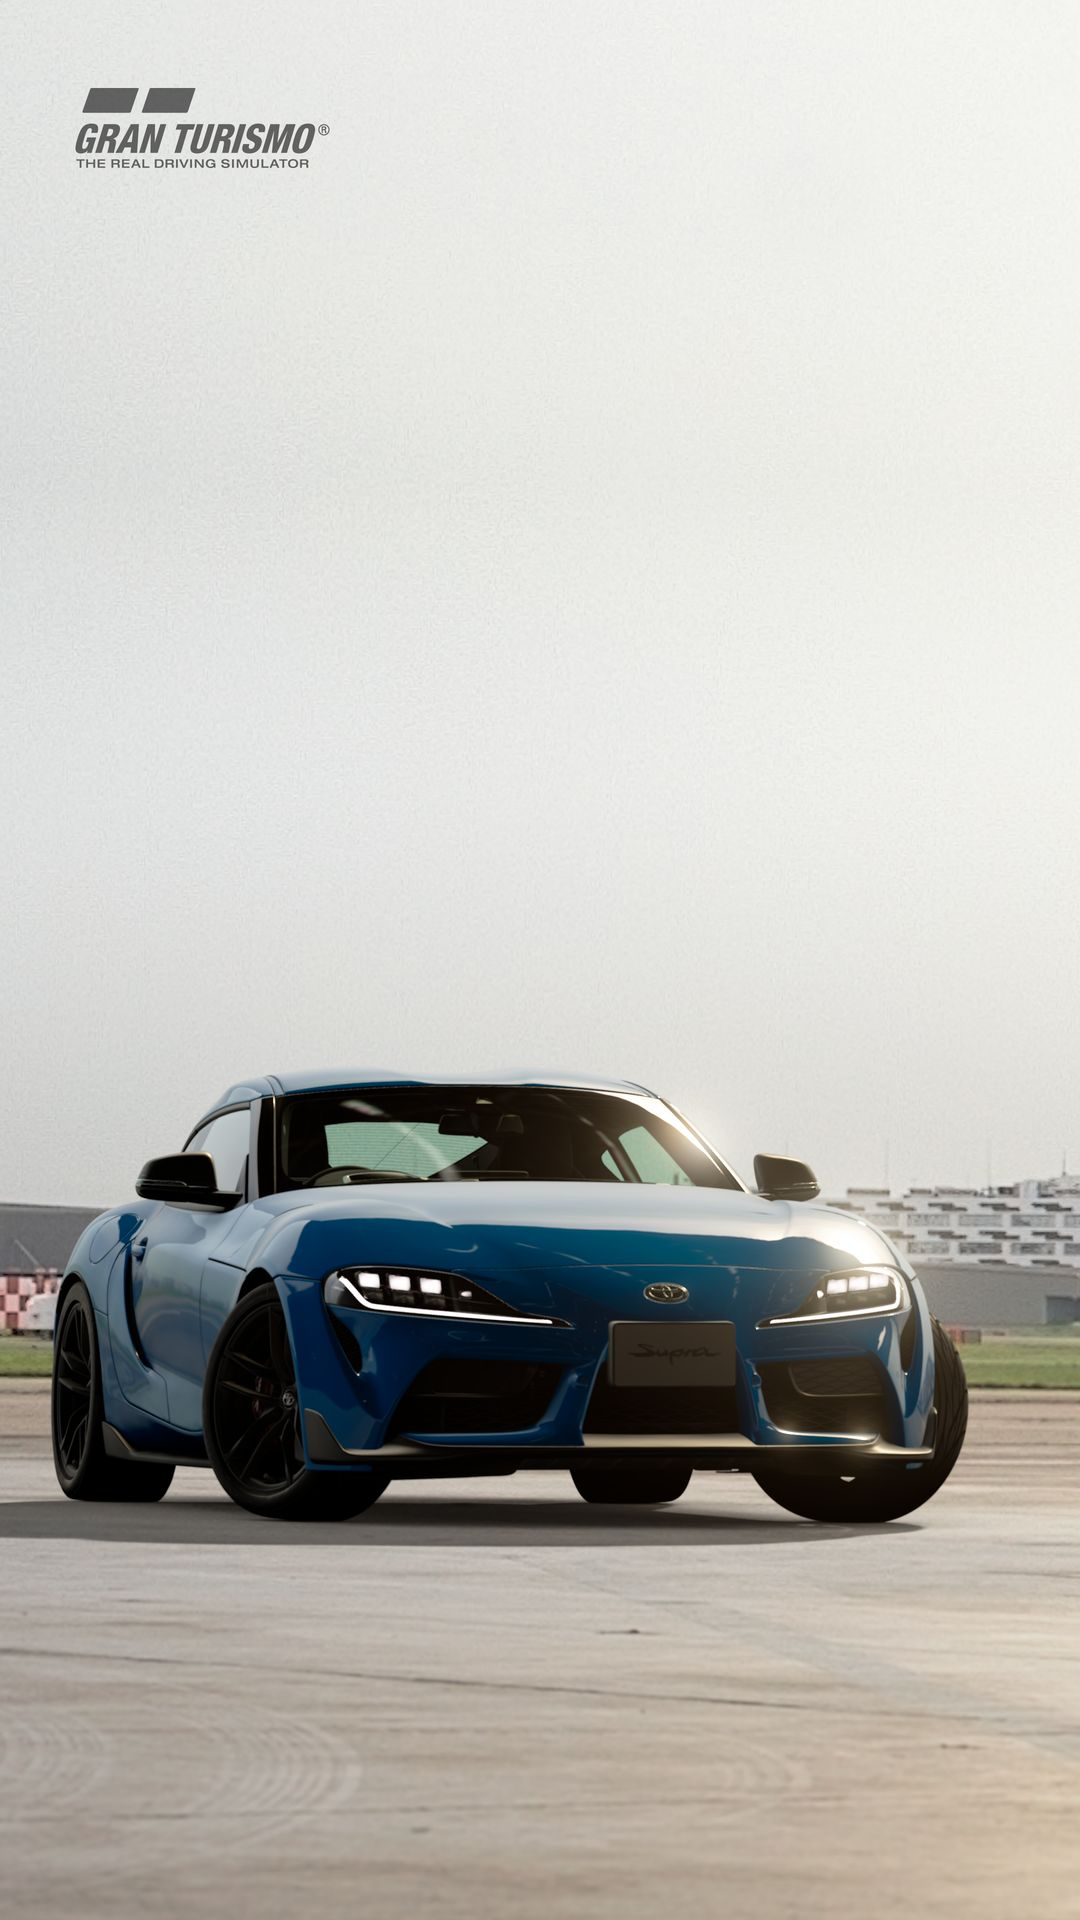 Toyota-Supra-Gran-Turismo-Sport-5